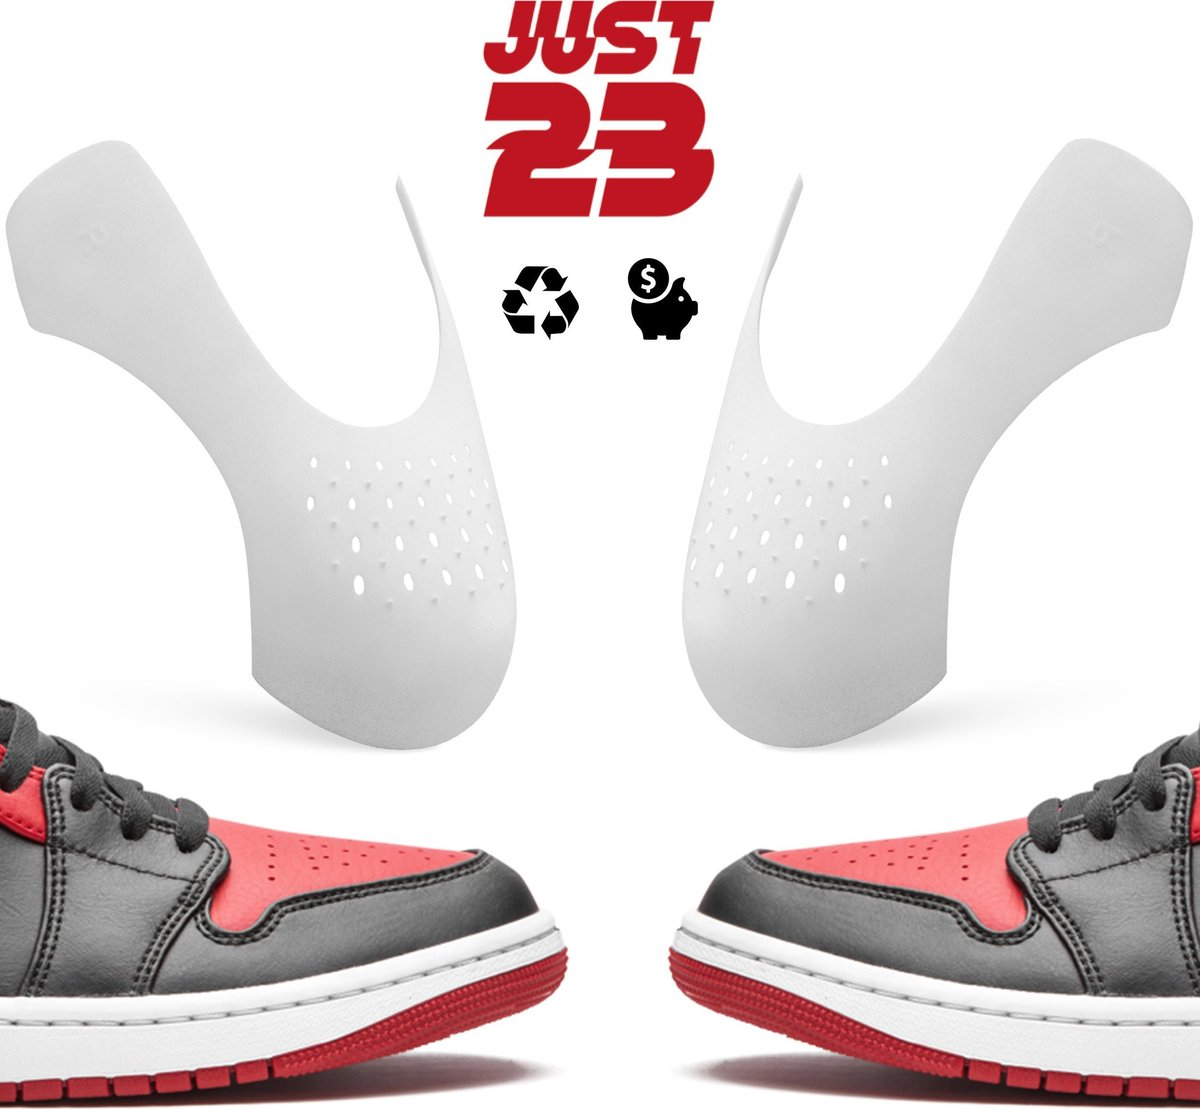 JUST23® Sneaker Crease Protector – Anti Crease – Wit  –  Maat 35-40 (S)  –  Sneaker Shield – Anti Kreuk – Alle Schoenen zoals...